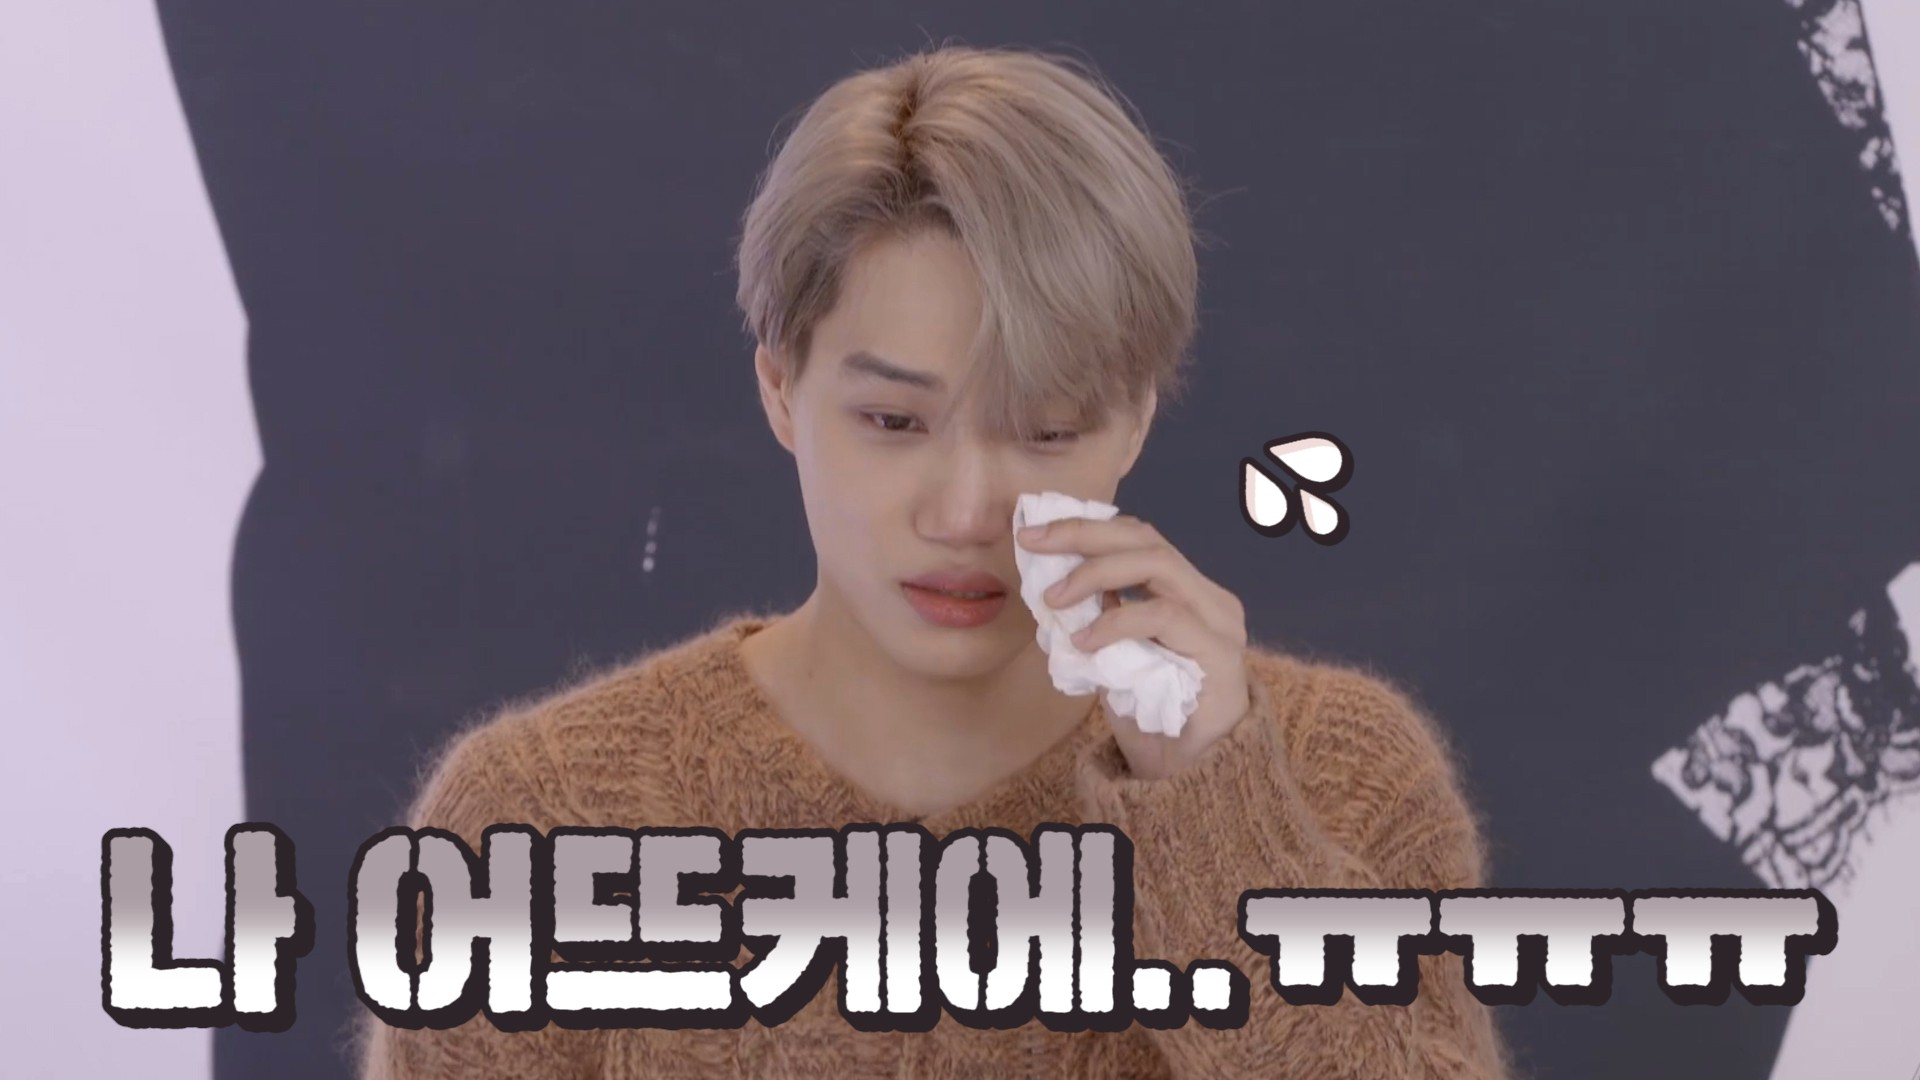 [EXO] 김뿌엥 귀여워서 어뜨케에..💦 나 또 김종인 사랑하네 ㅂㅇㅠ (KAI reading EXO-L's letter)